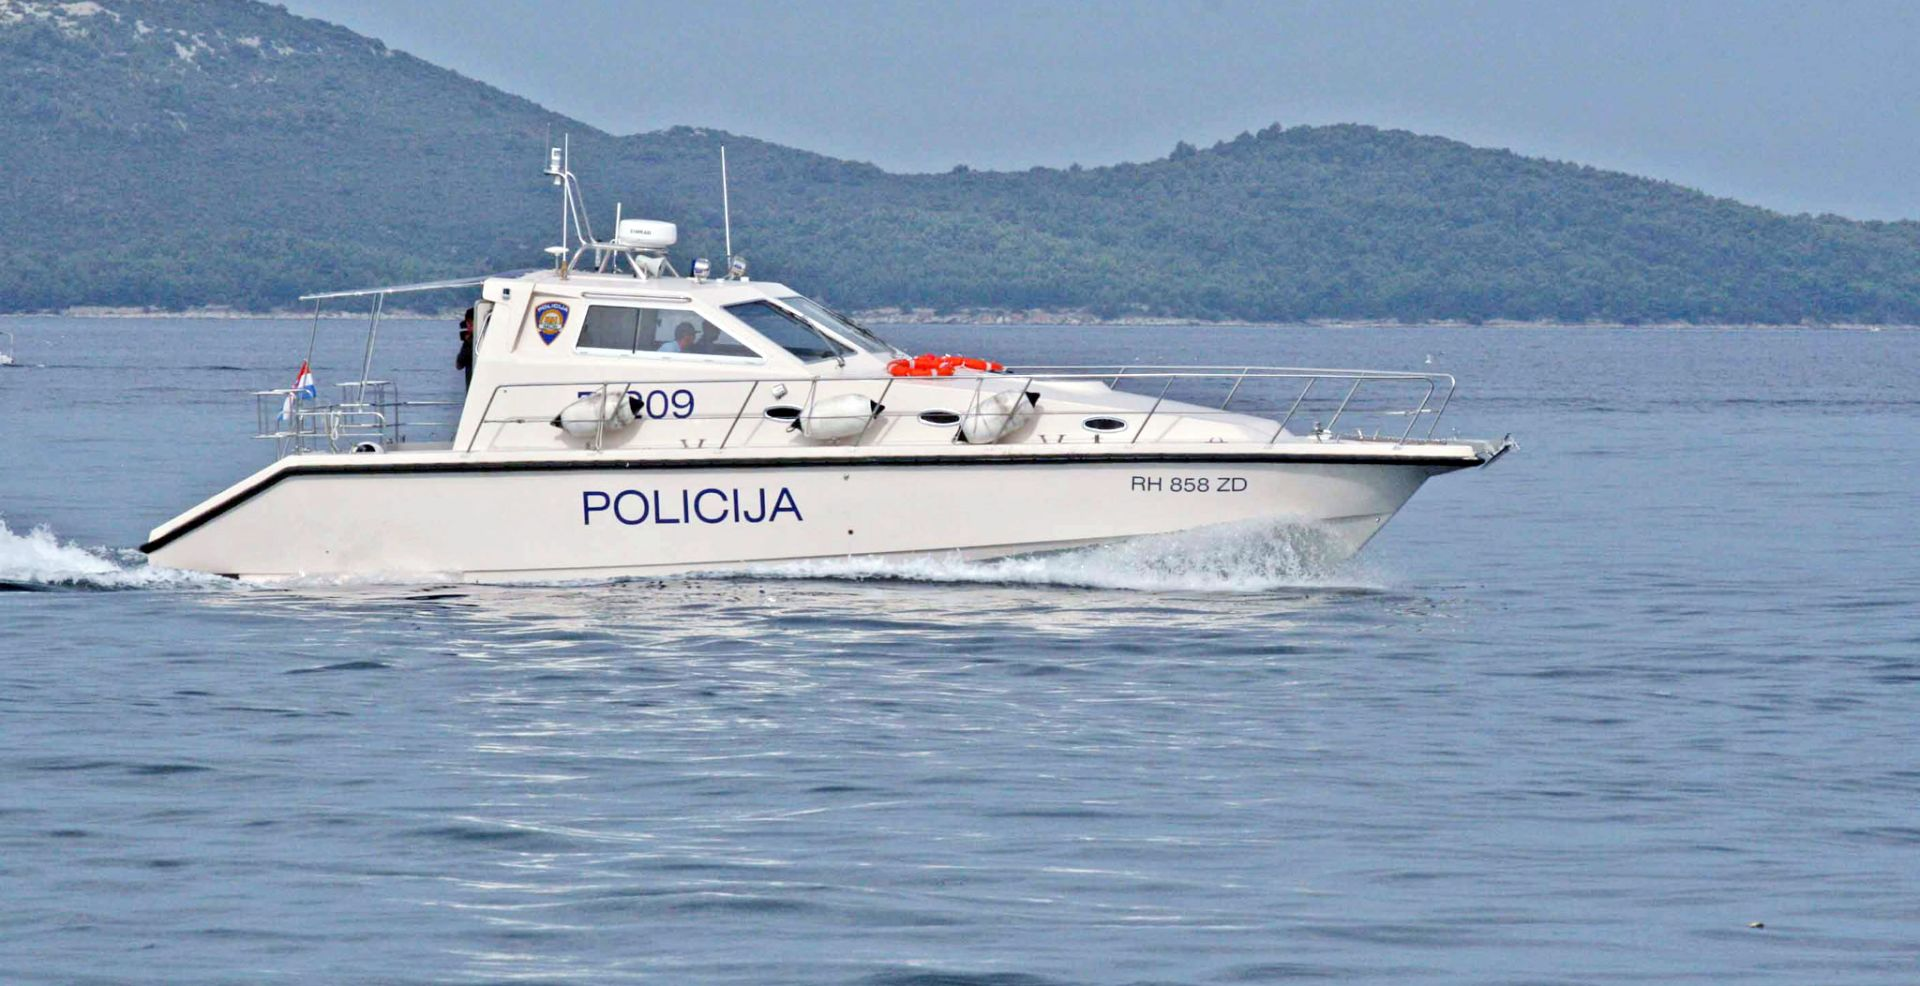 S Italijom dogovorena trogodišnja zabrana ribolova u Jabučkoj kotlini